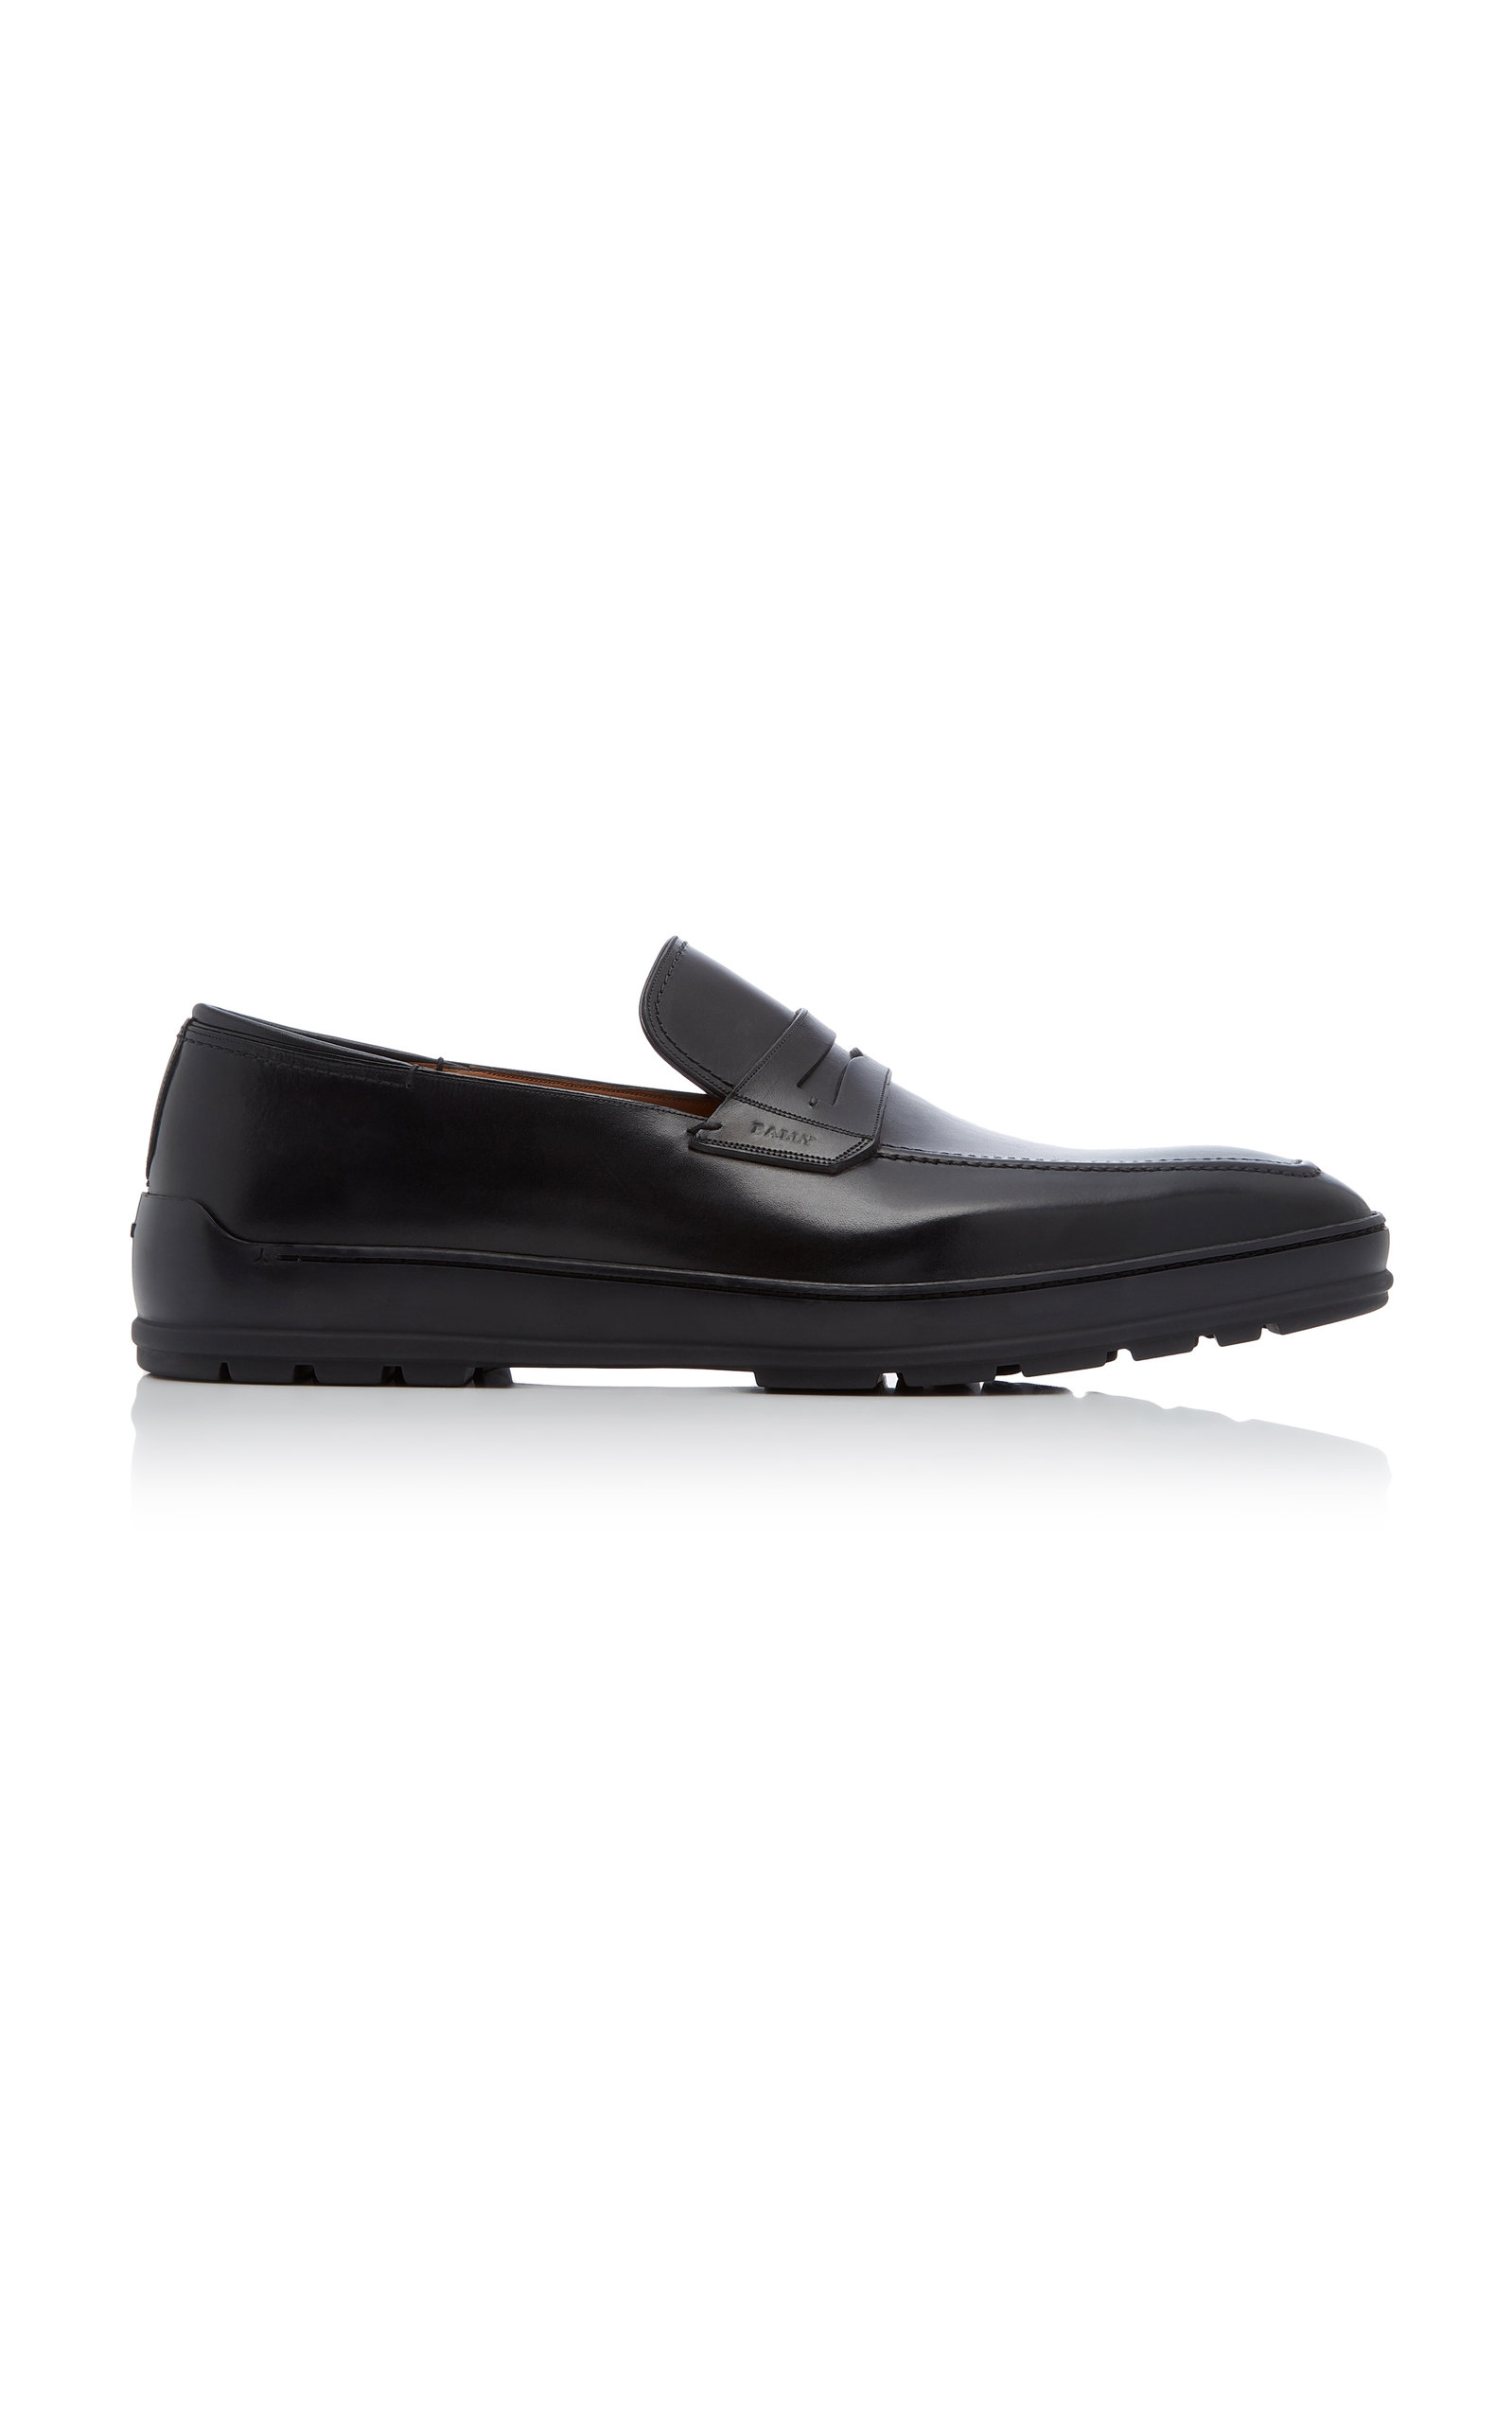 1f64d4b4425 BallyRelon Leather Penny Loafers. CLOSE. Loading